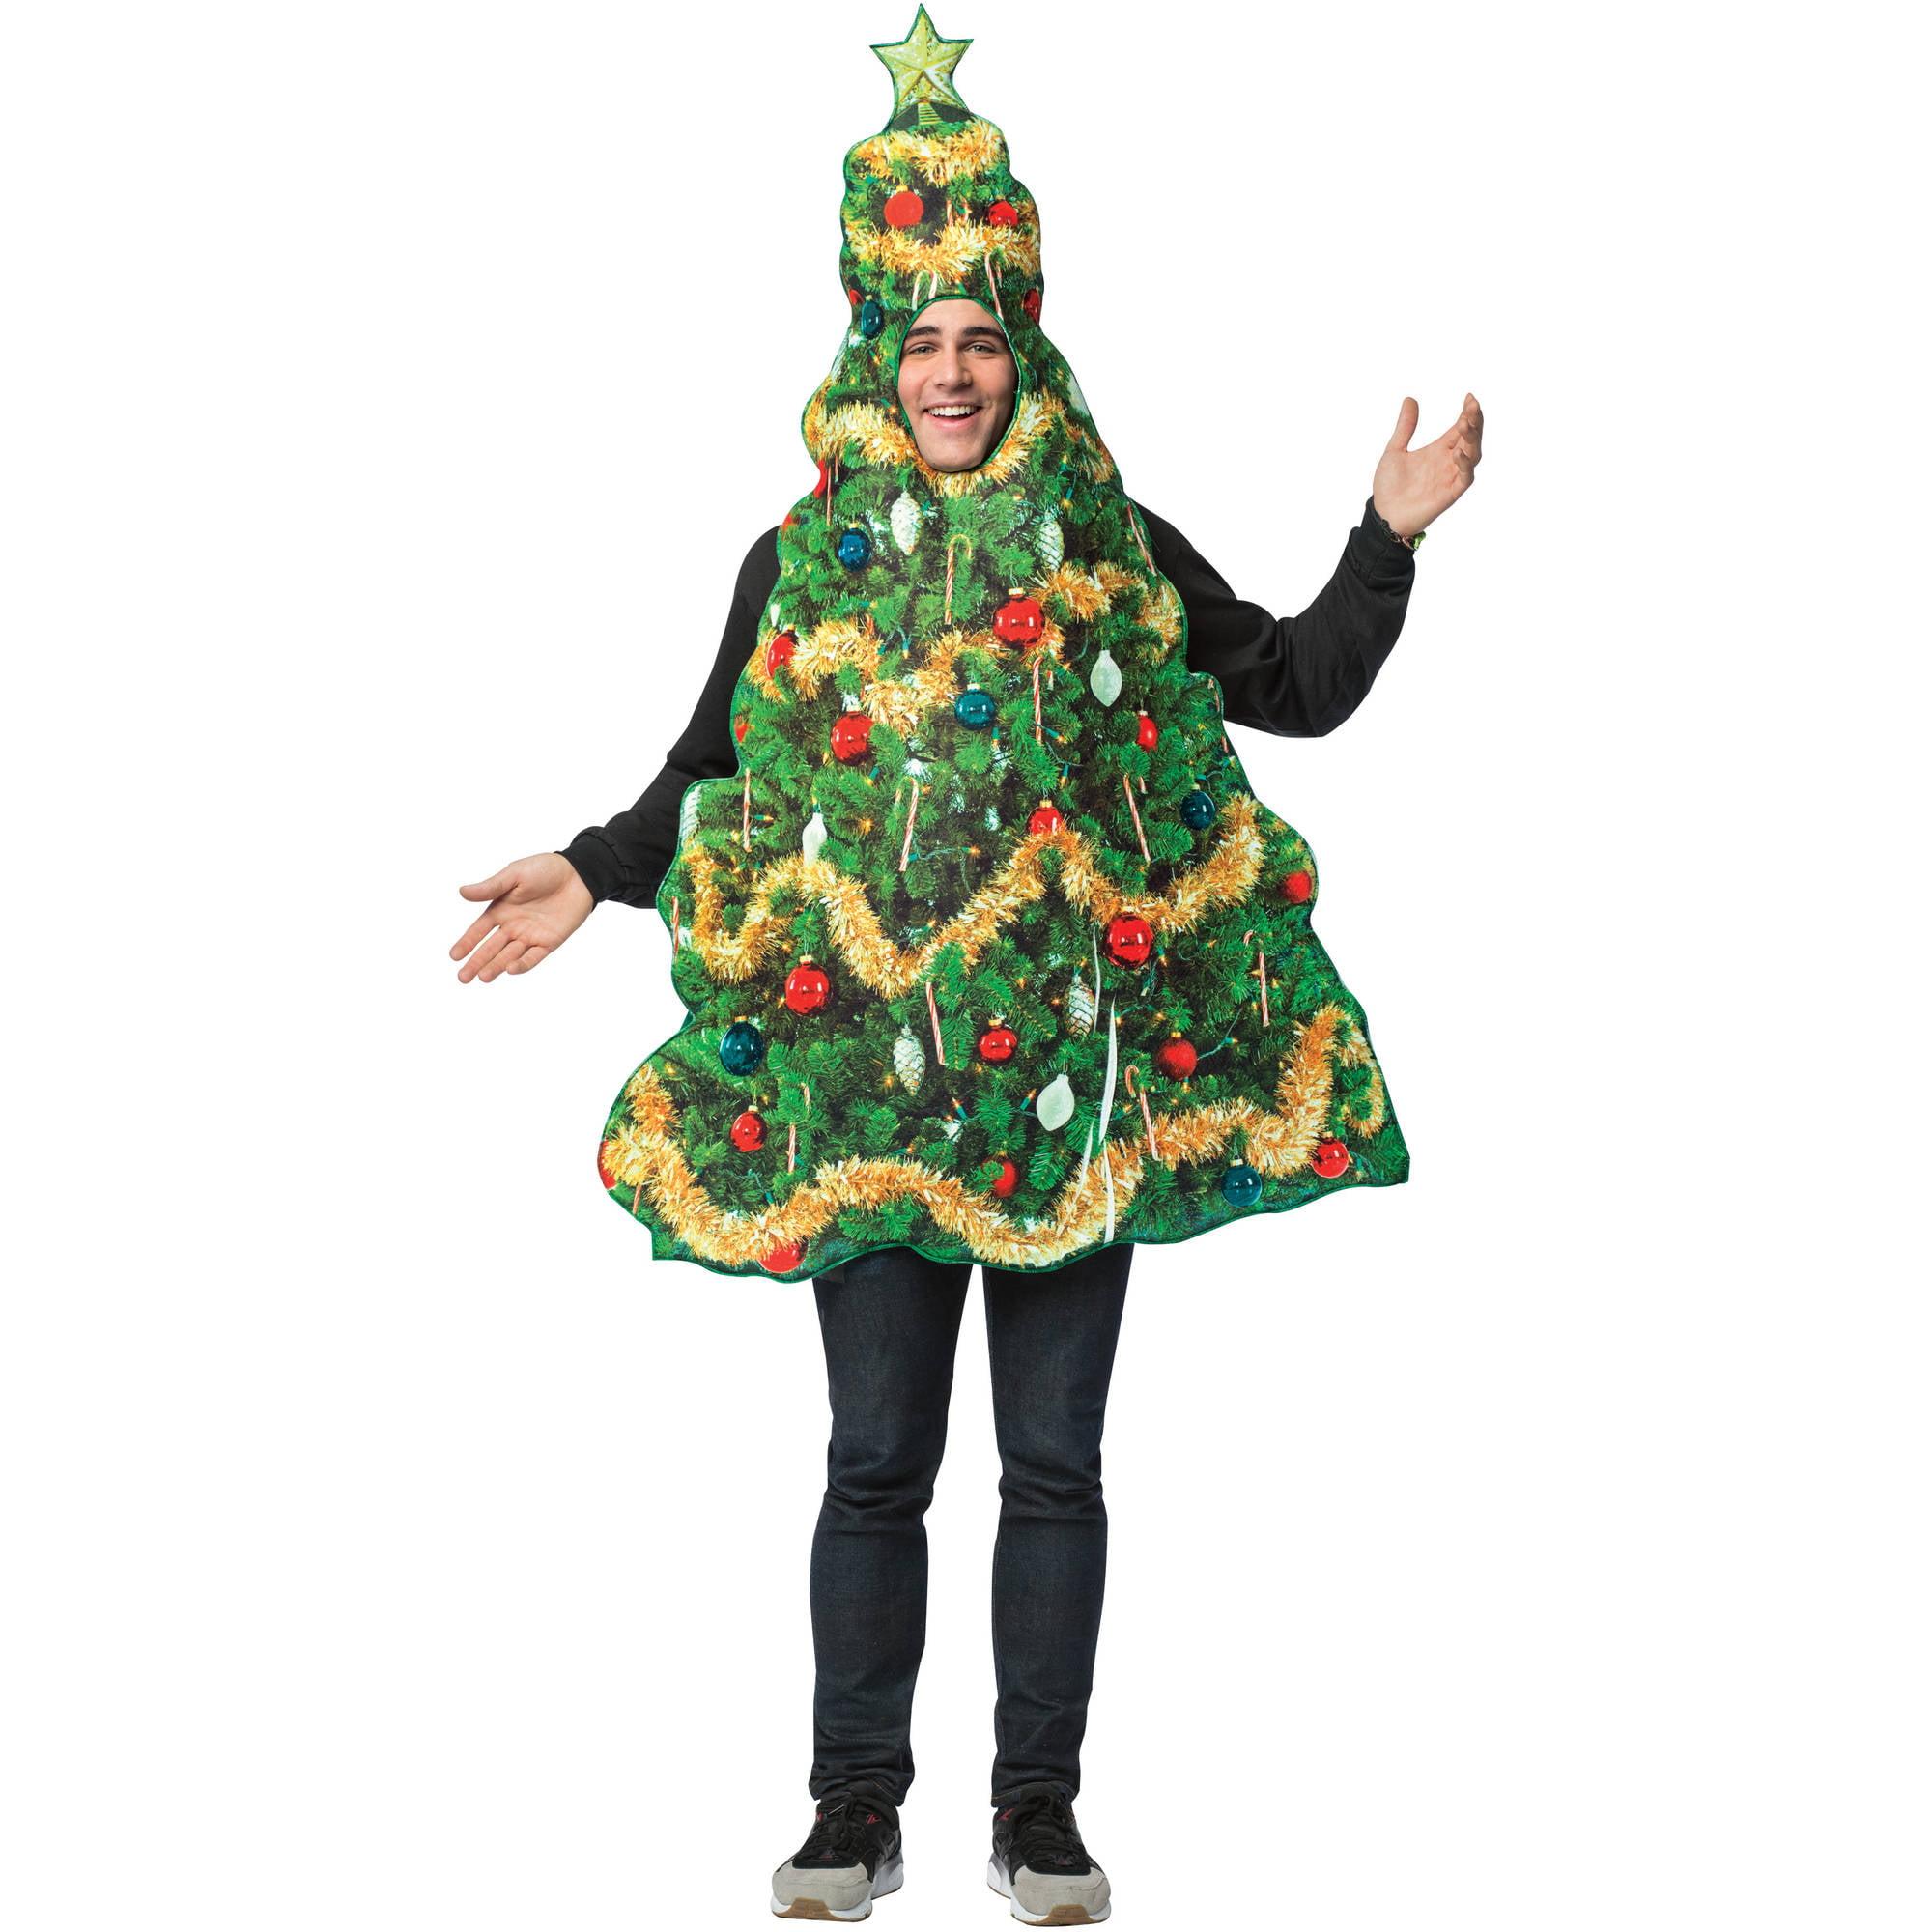 sc 1 st  Walmart & Get Real Christmas Tree - Walmart.com